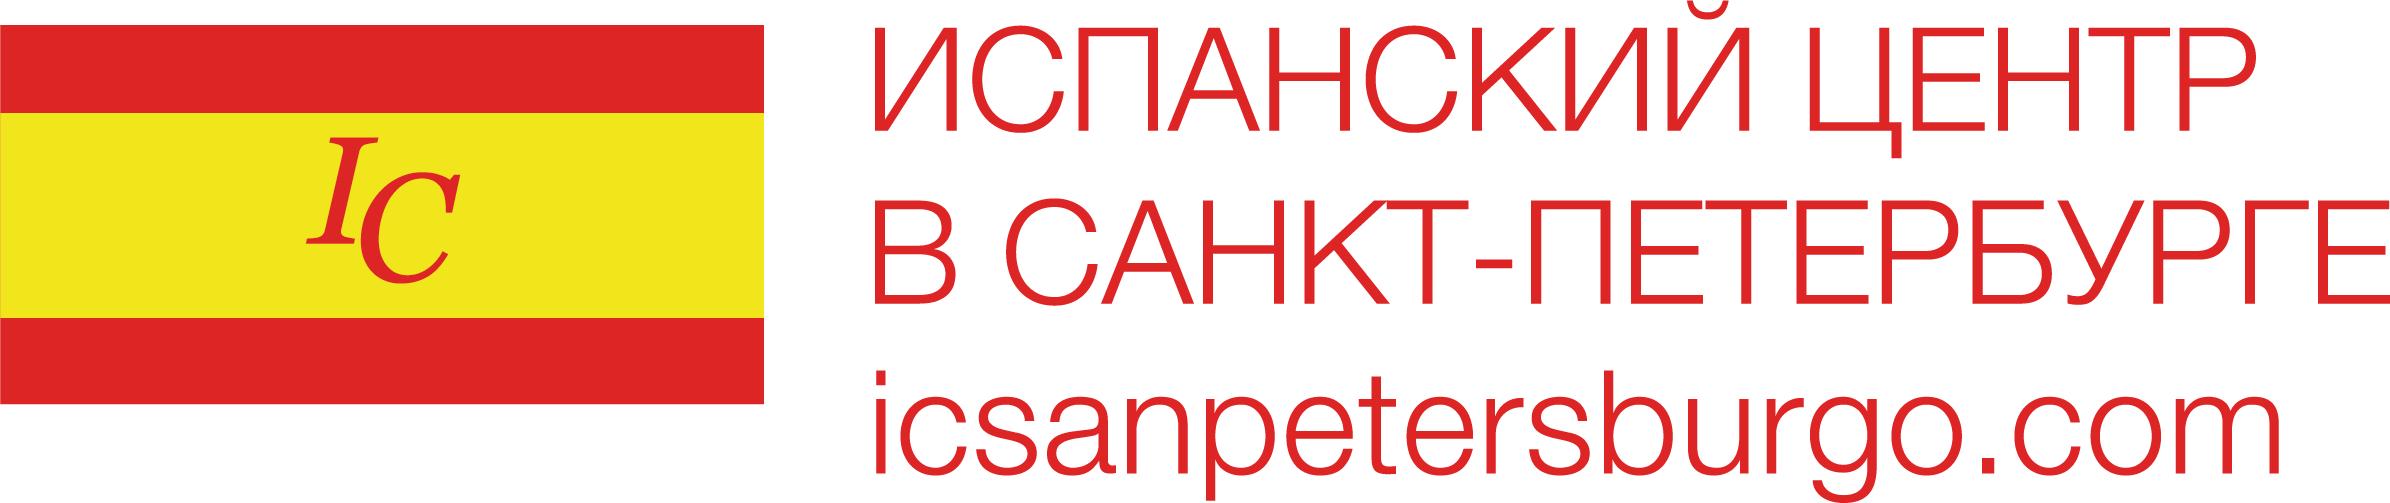 Ispansky Centre.png